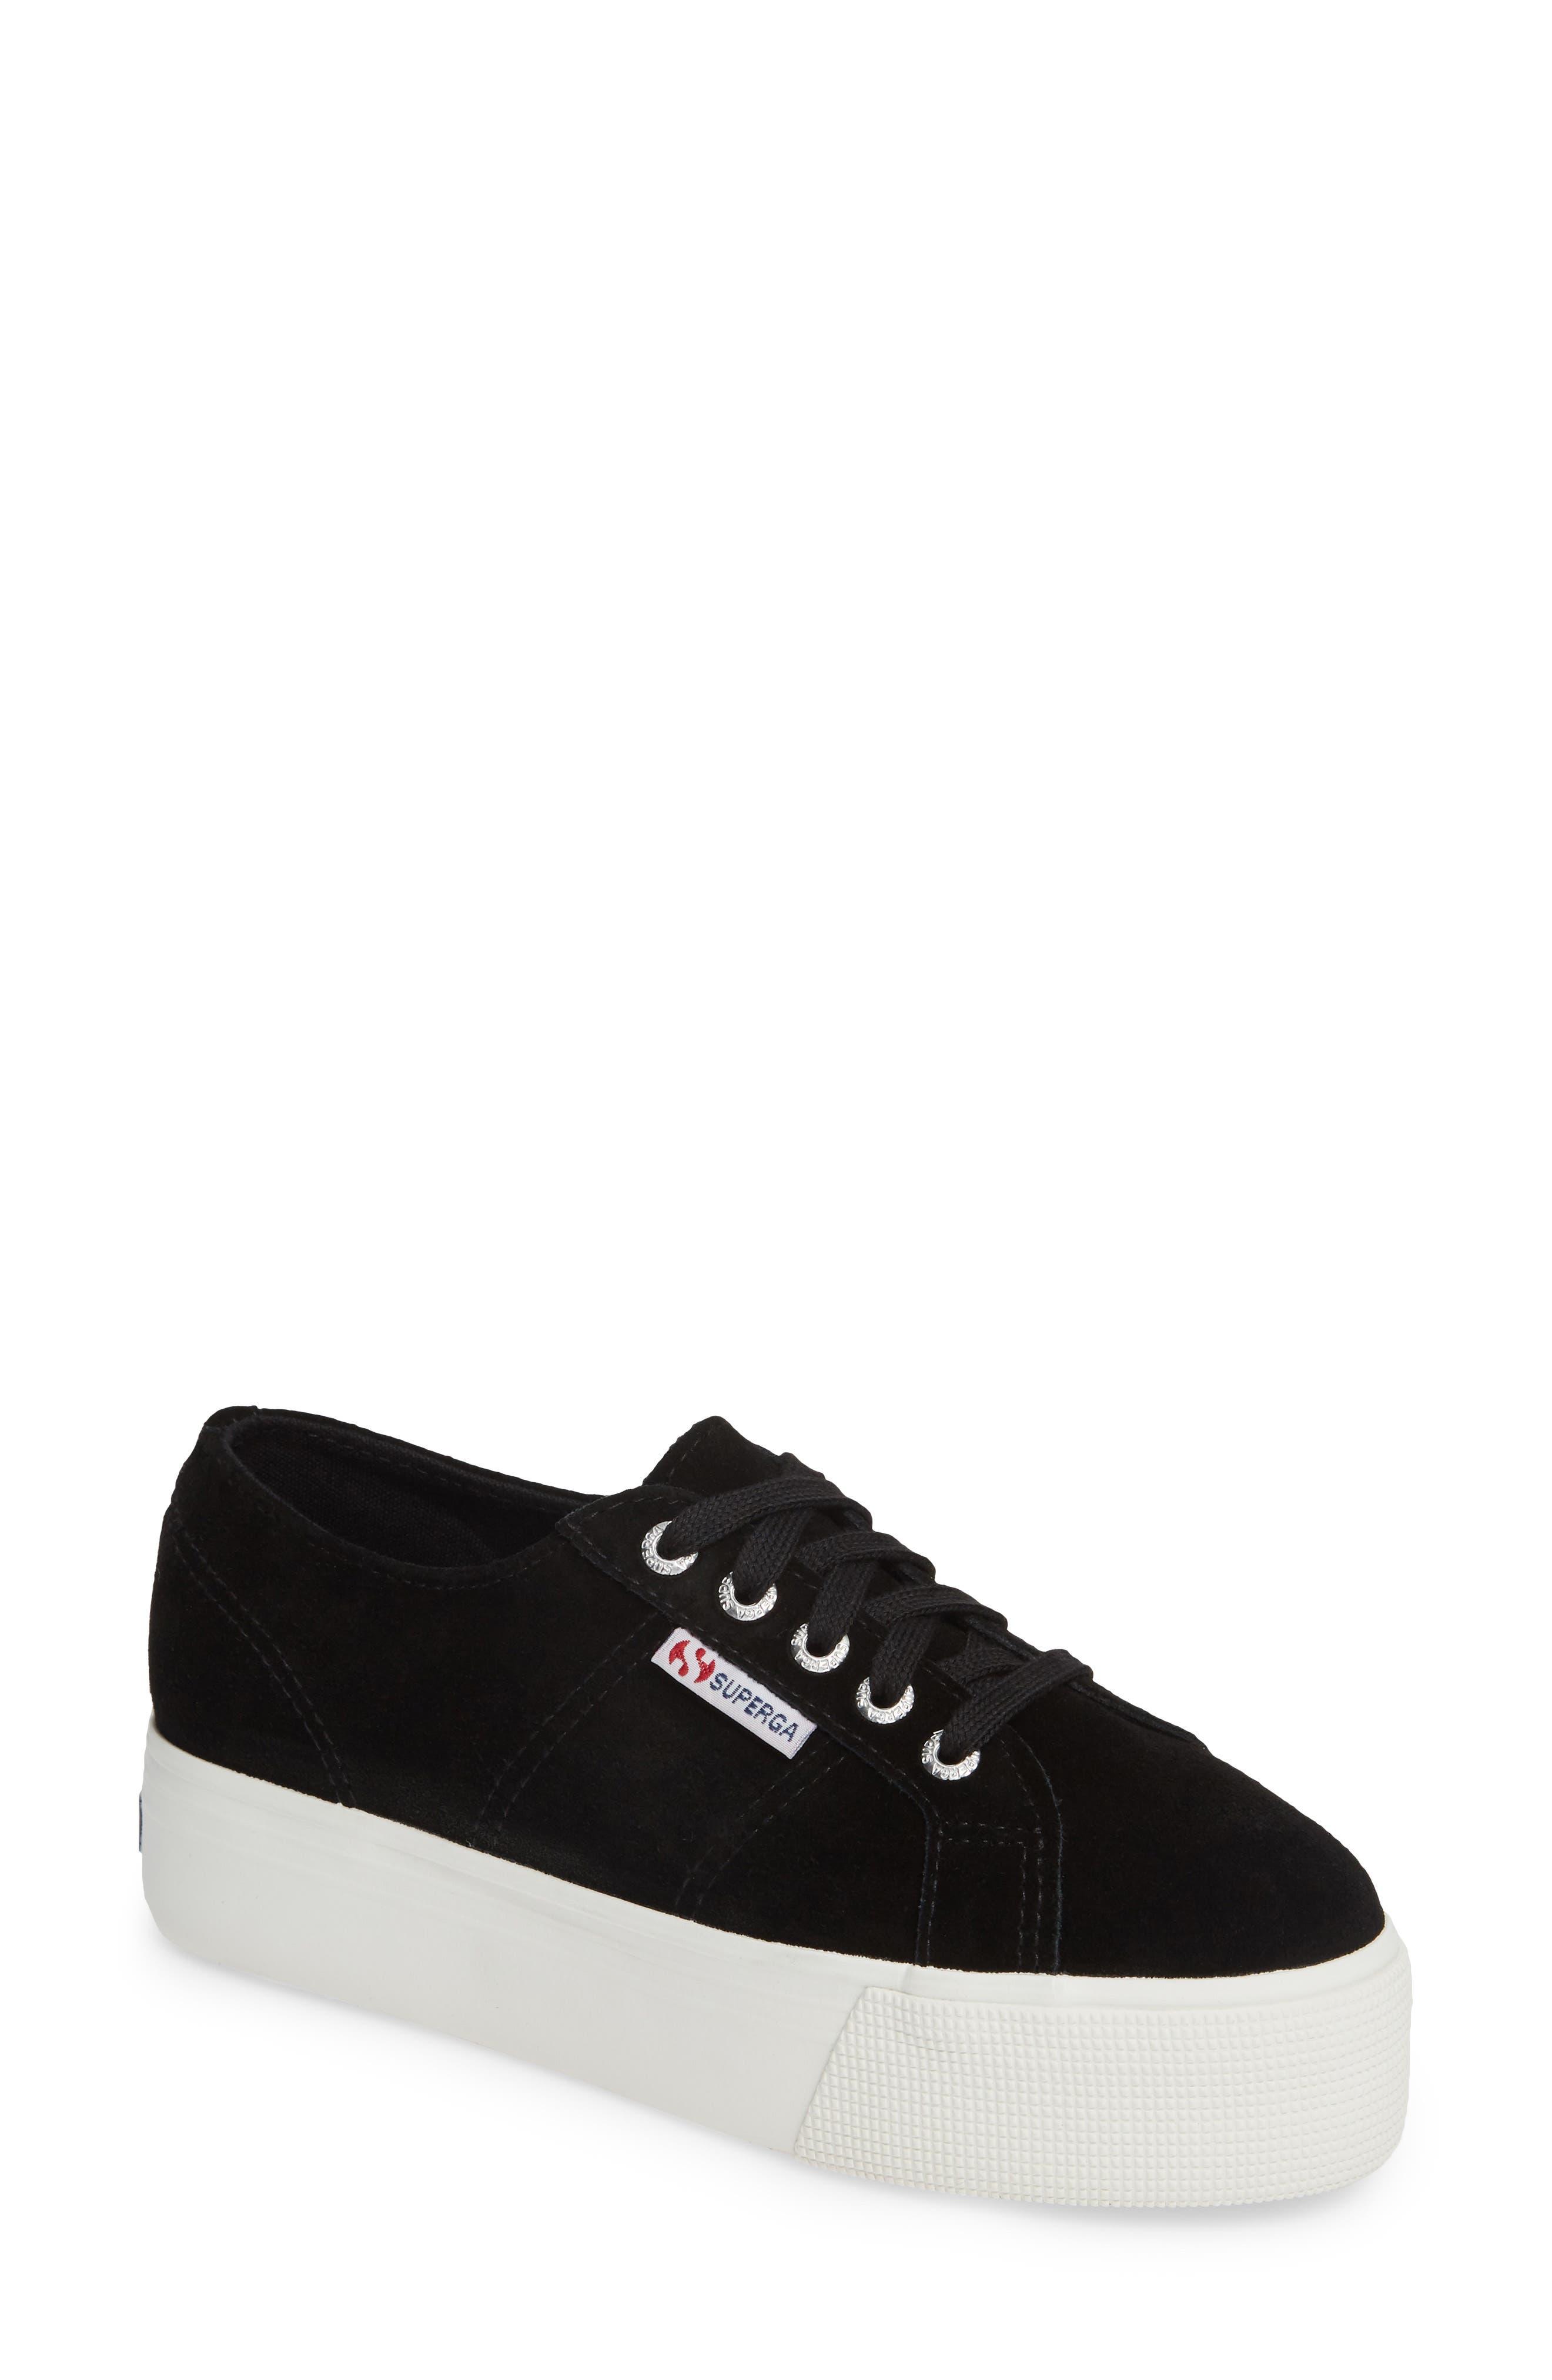 2790 Platform Sneaker,                             Main thumbnail 1, color,                             006